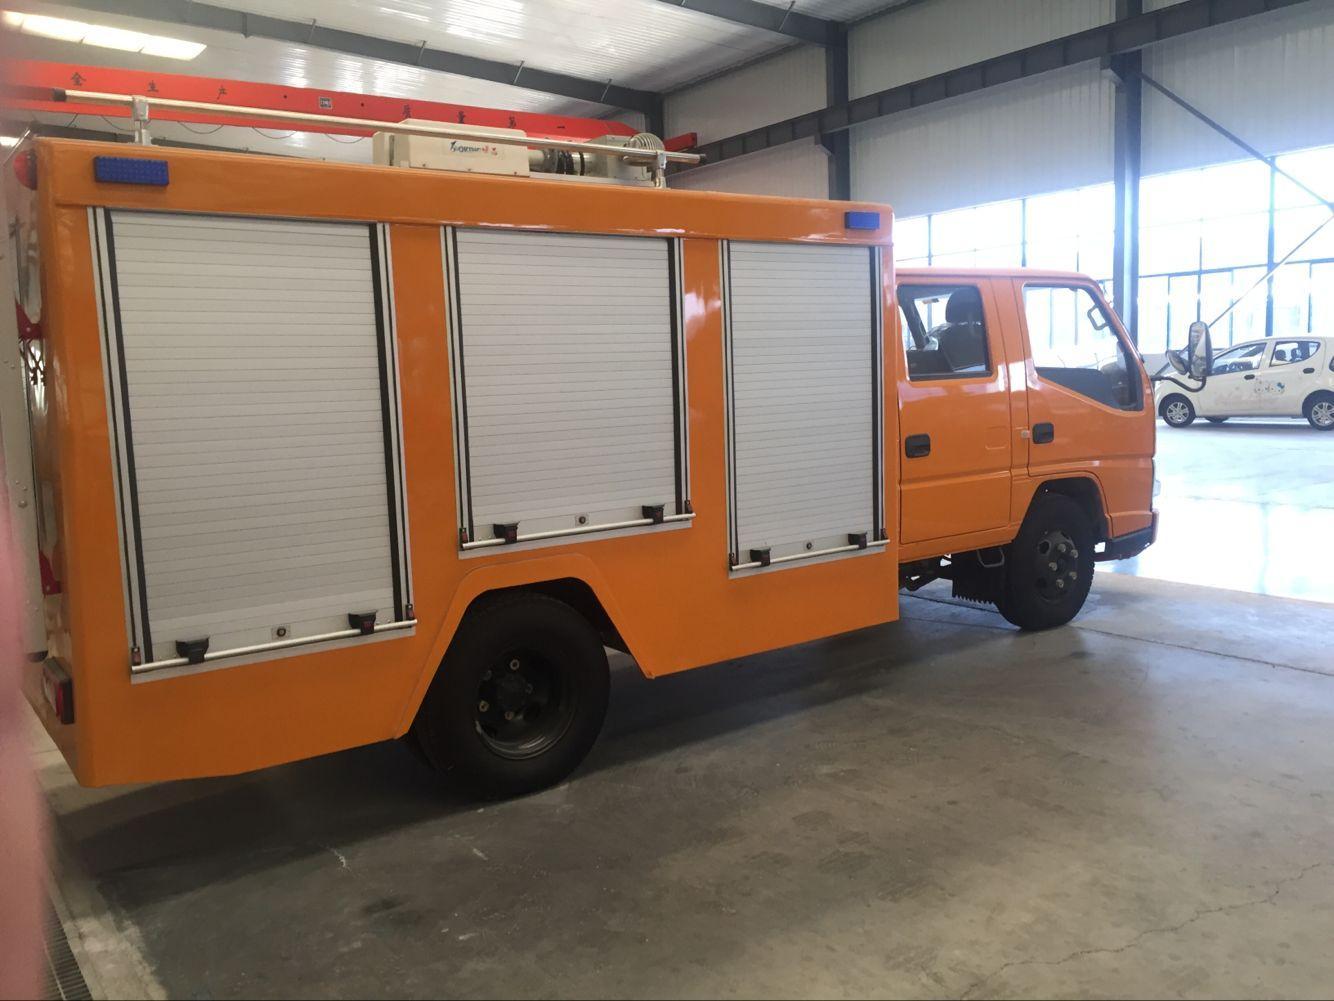 Roll up Door Firefighting Emergency Truck Special Vehicles Roller Shutter 1